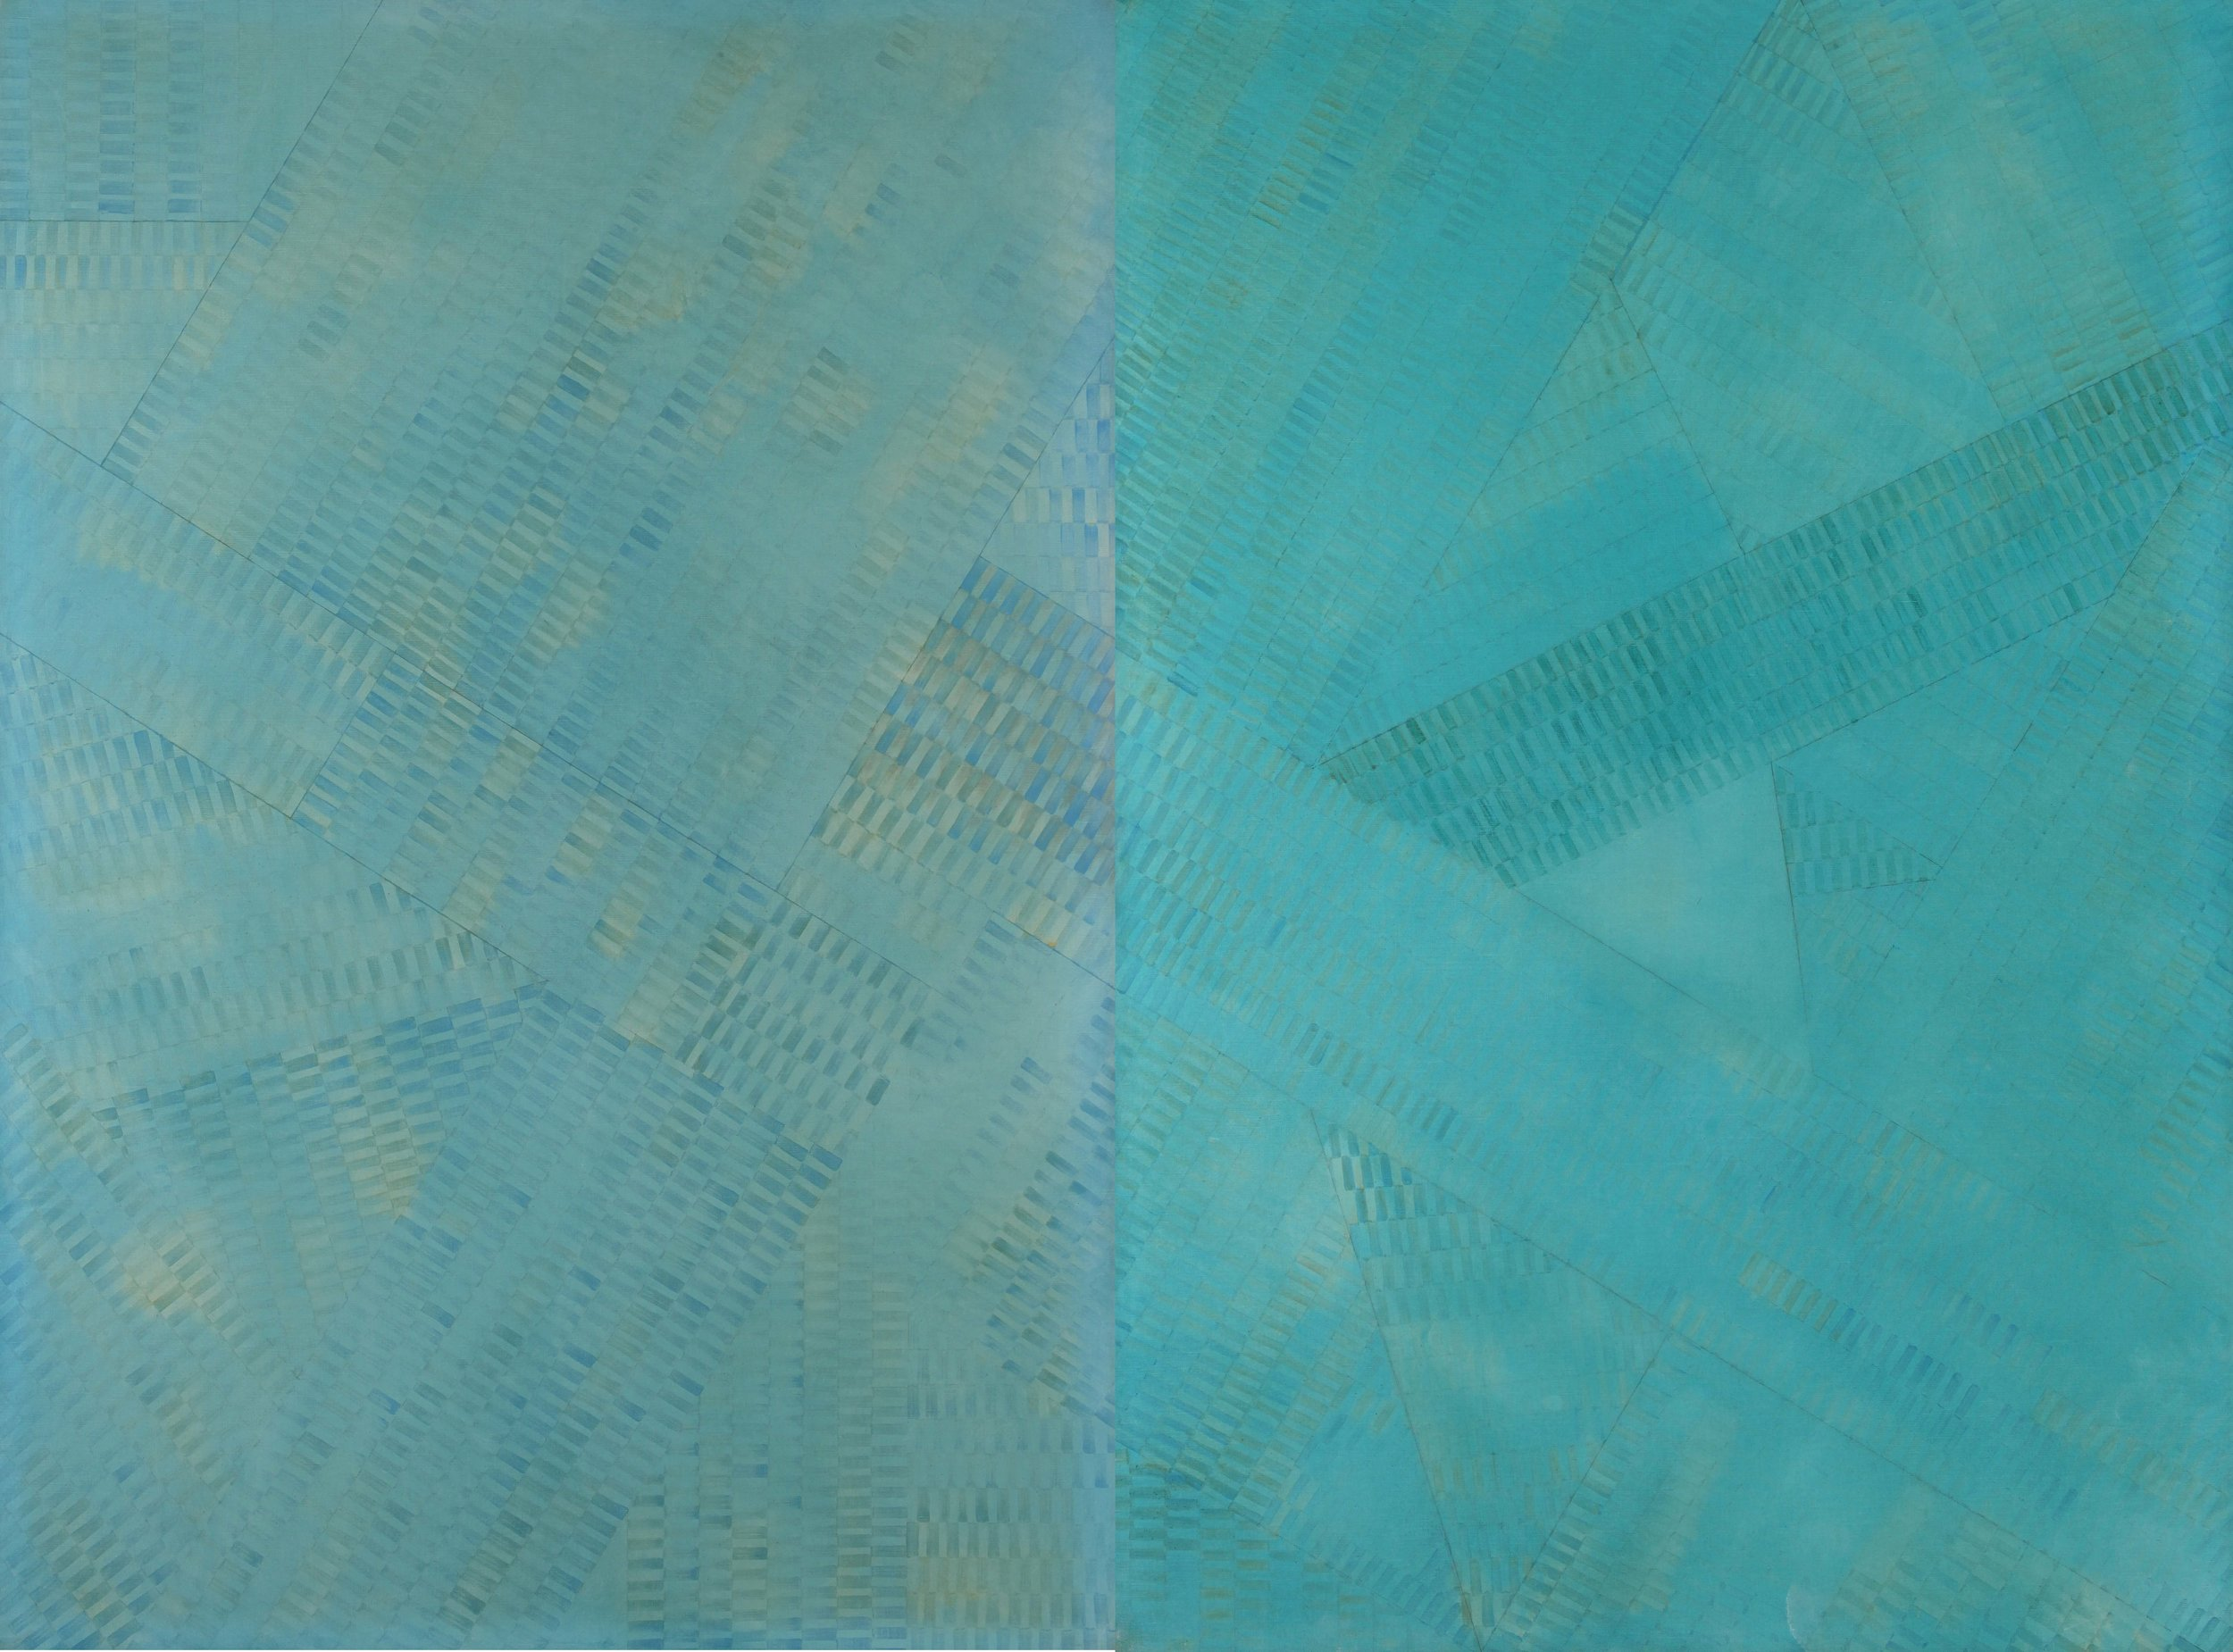 Itami Jun,  Manhattan Series,  1995, huile sur toile, 193.9 x 260.6 cm. Courtesy of the artist & The Columns Gallery